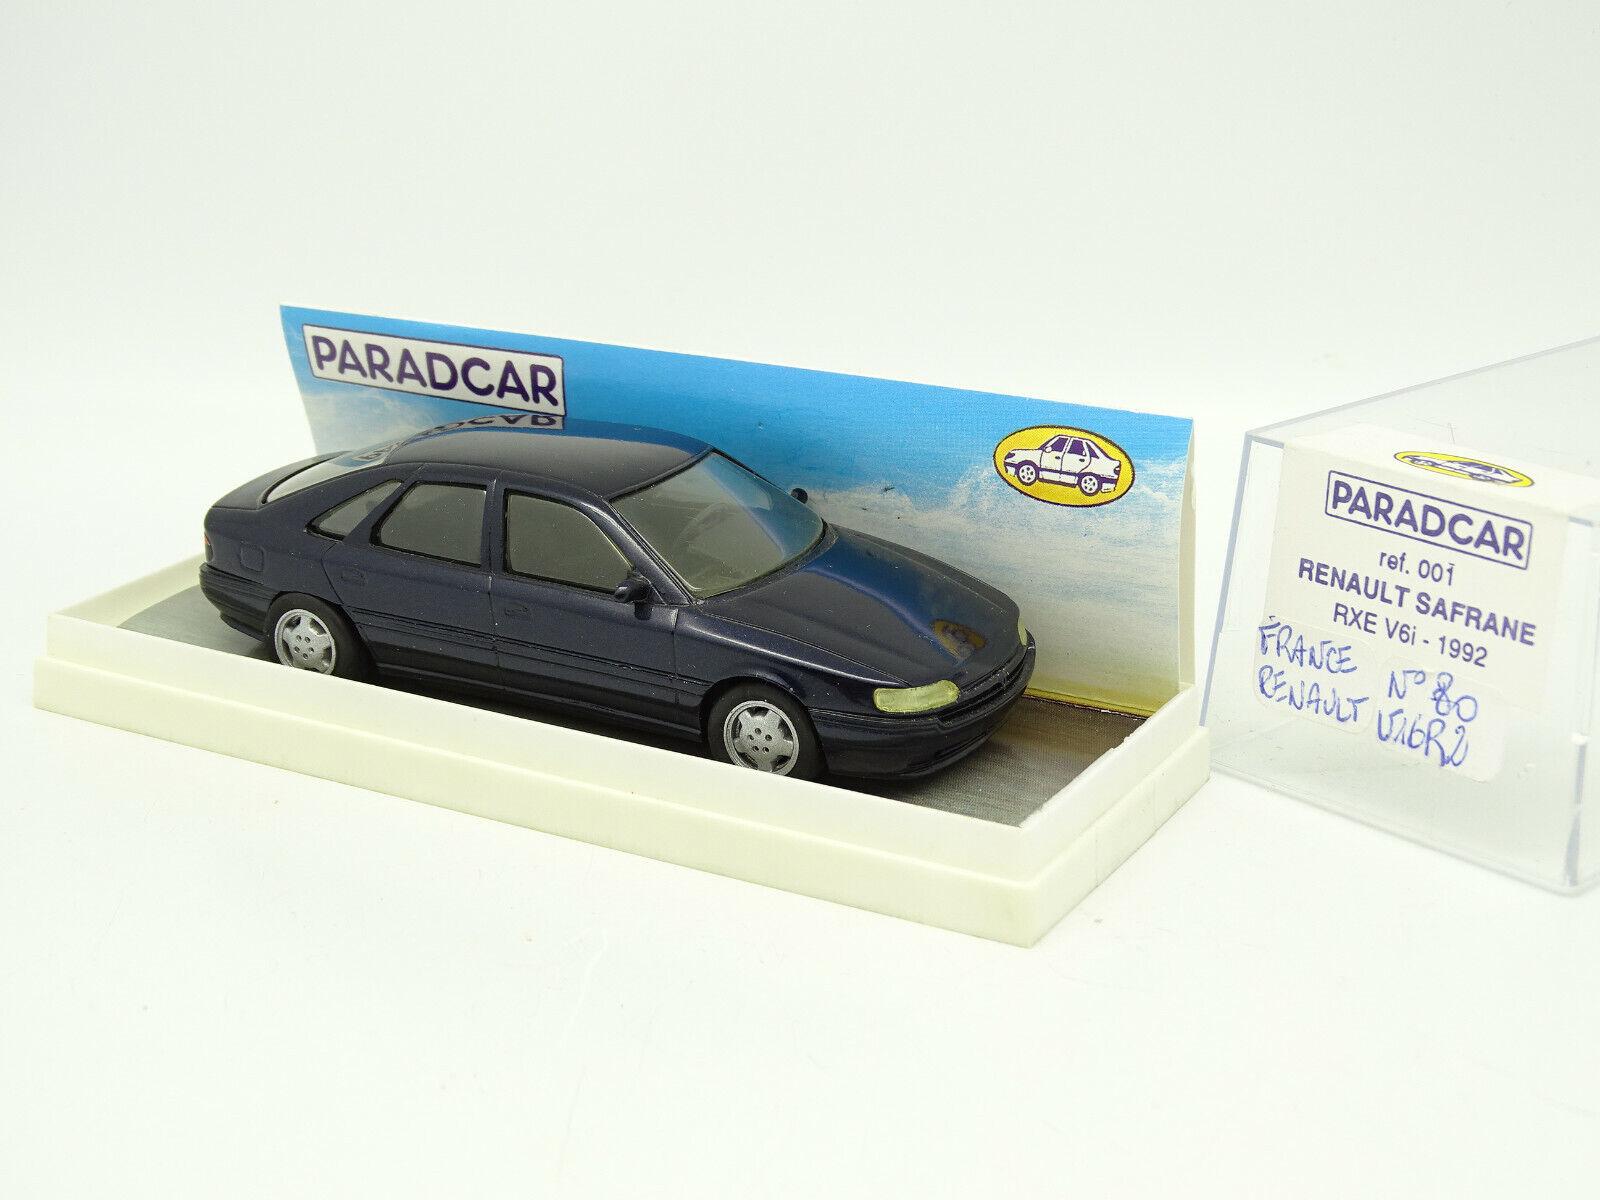 Paradcar 1 43 - Renault Safrane rxe v6 1992